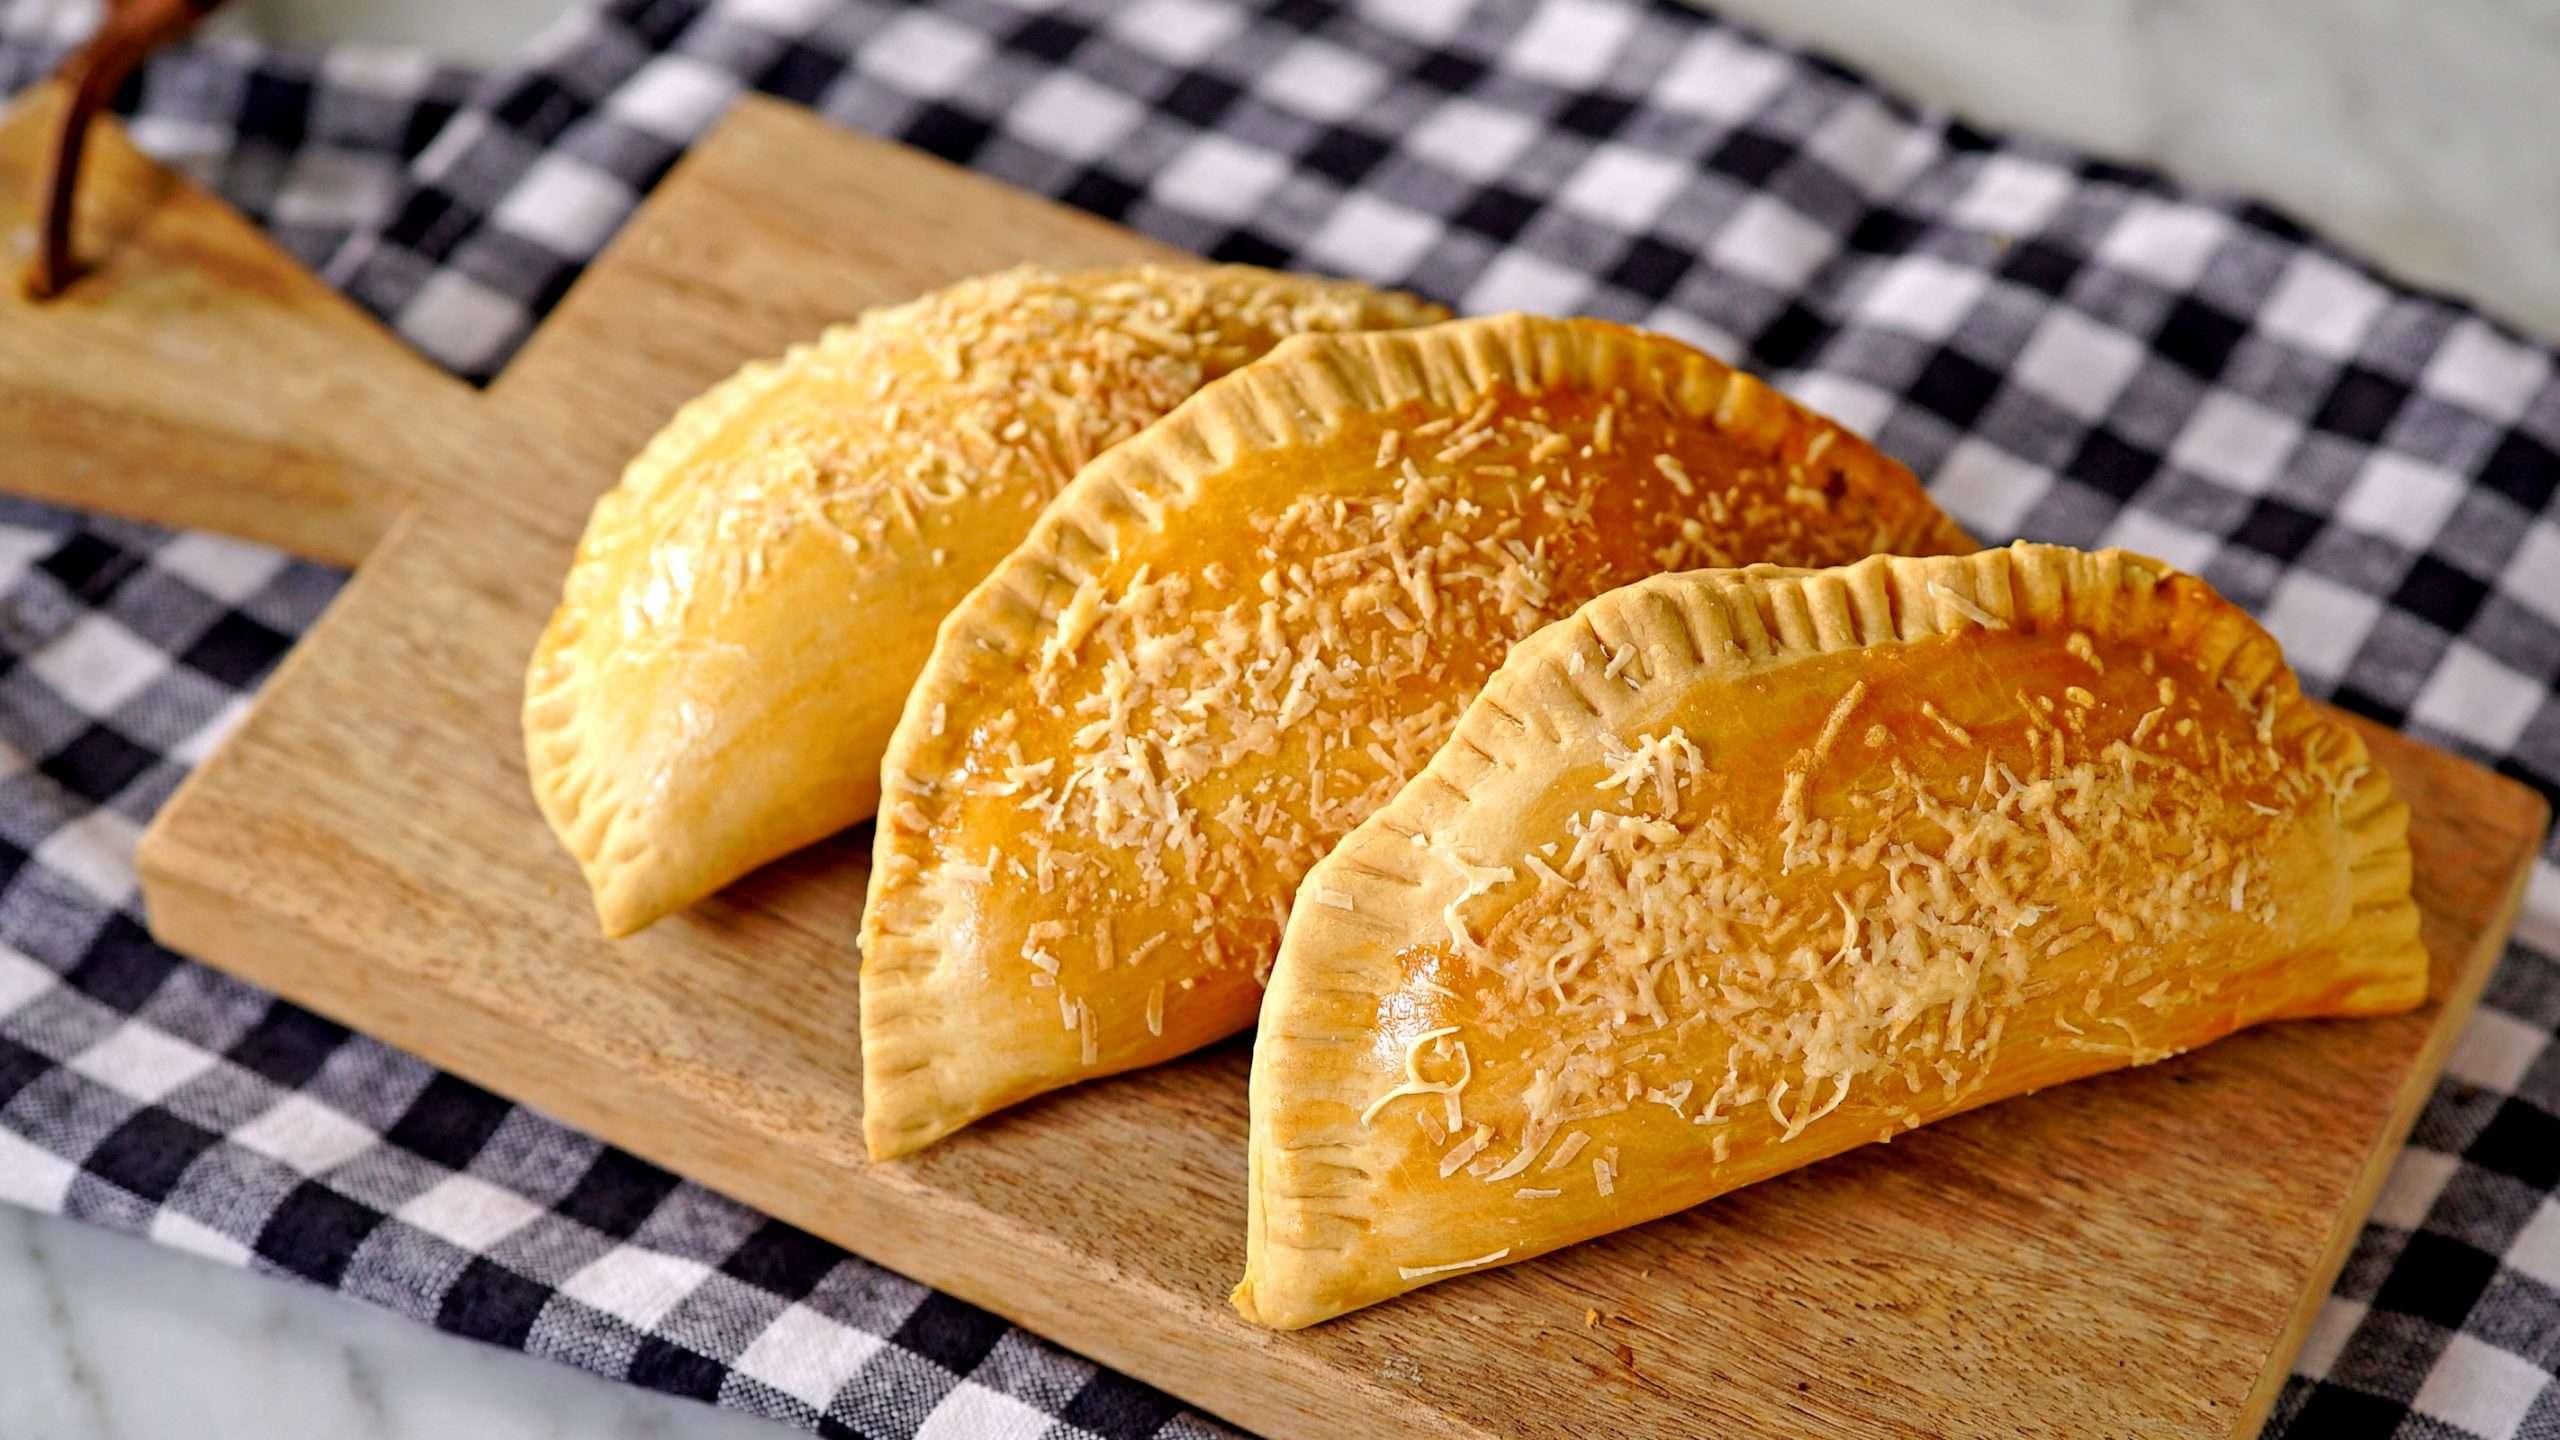 Receita de Pastel de forno com recheio de frango Delicioso